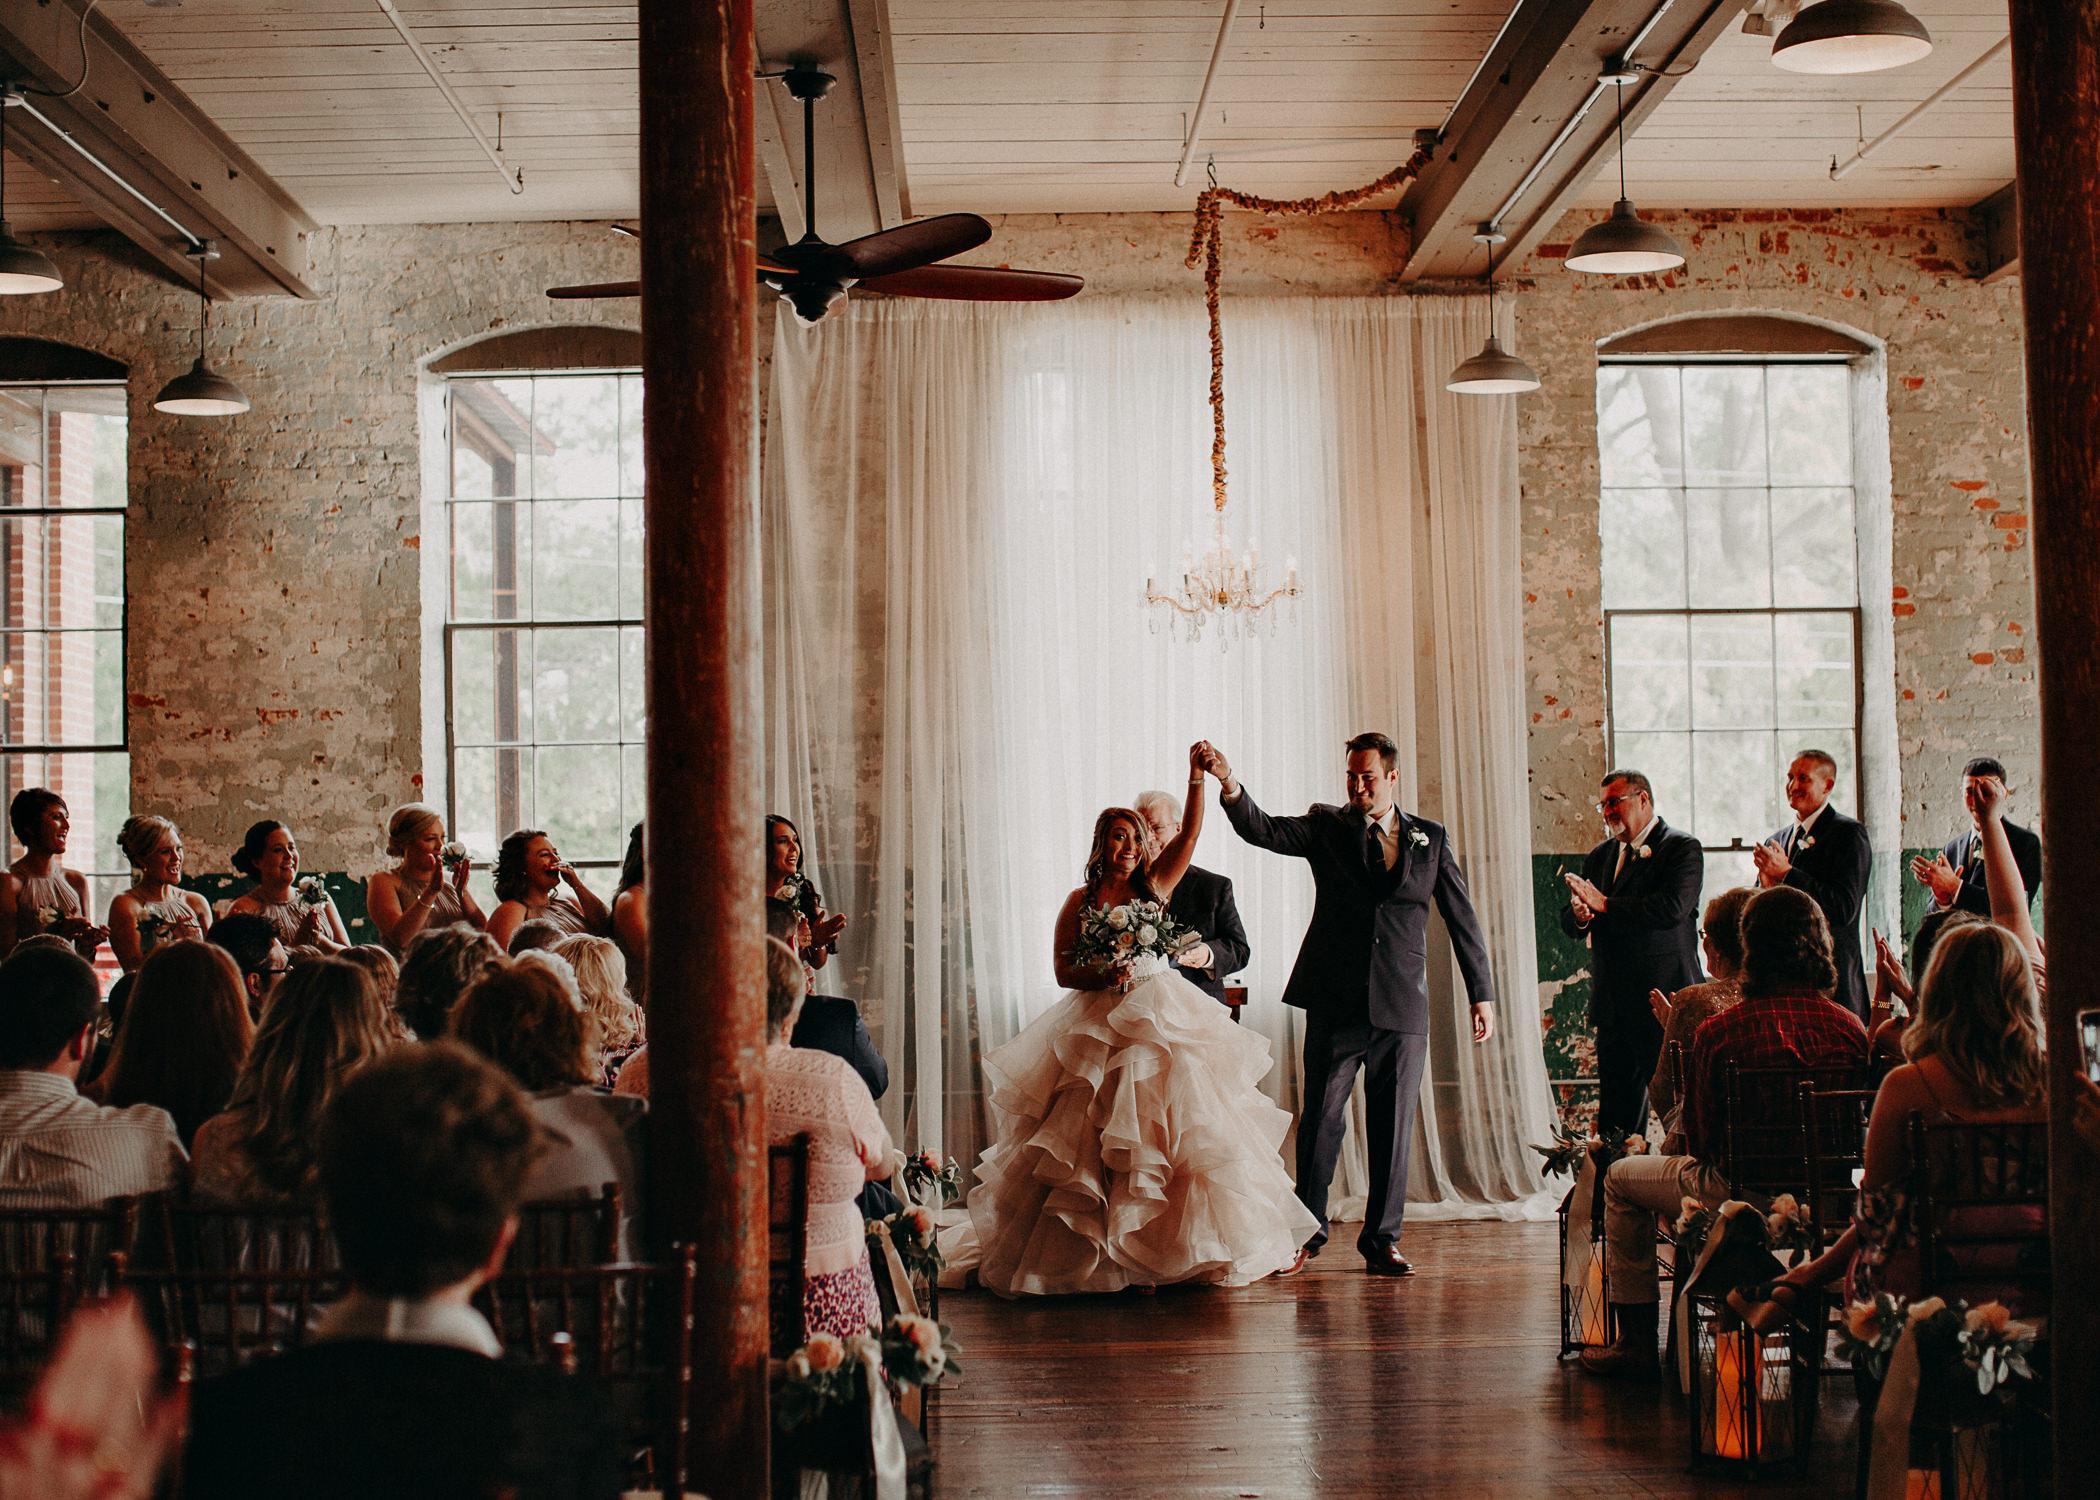 46 4 - Atlanta Wedding Photographer - The engine room - Ga - Wedding trends - Aline Marin Photography.jpg